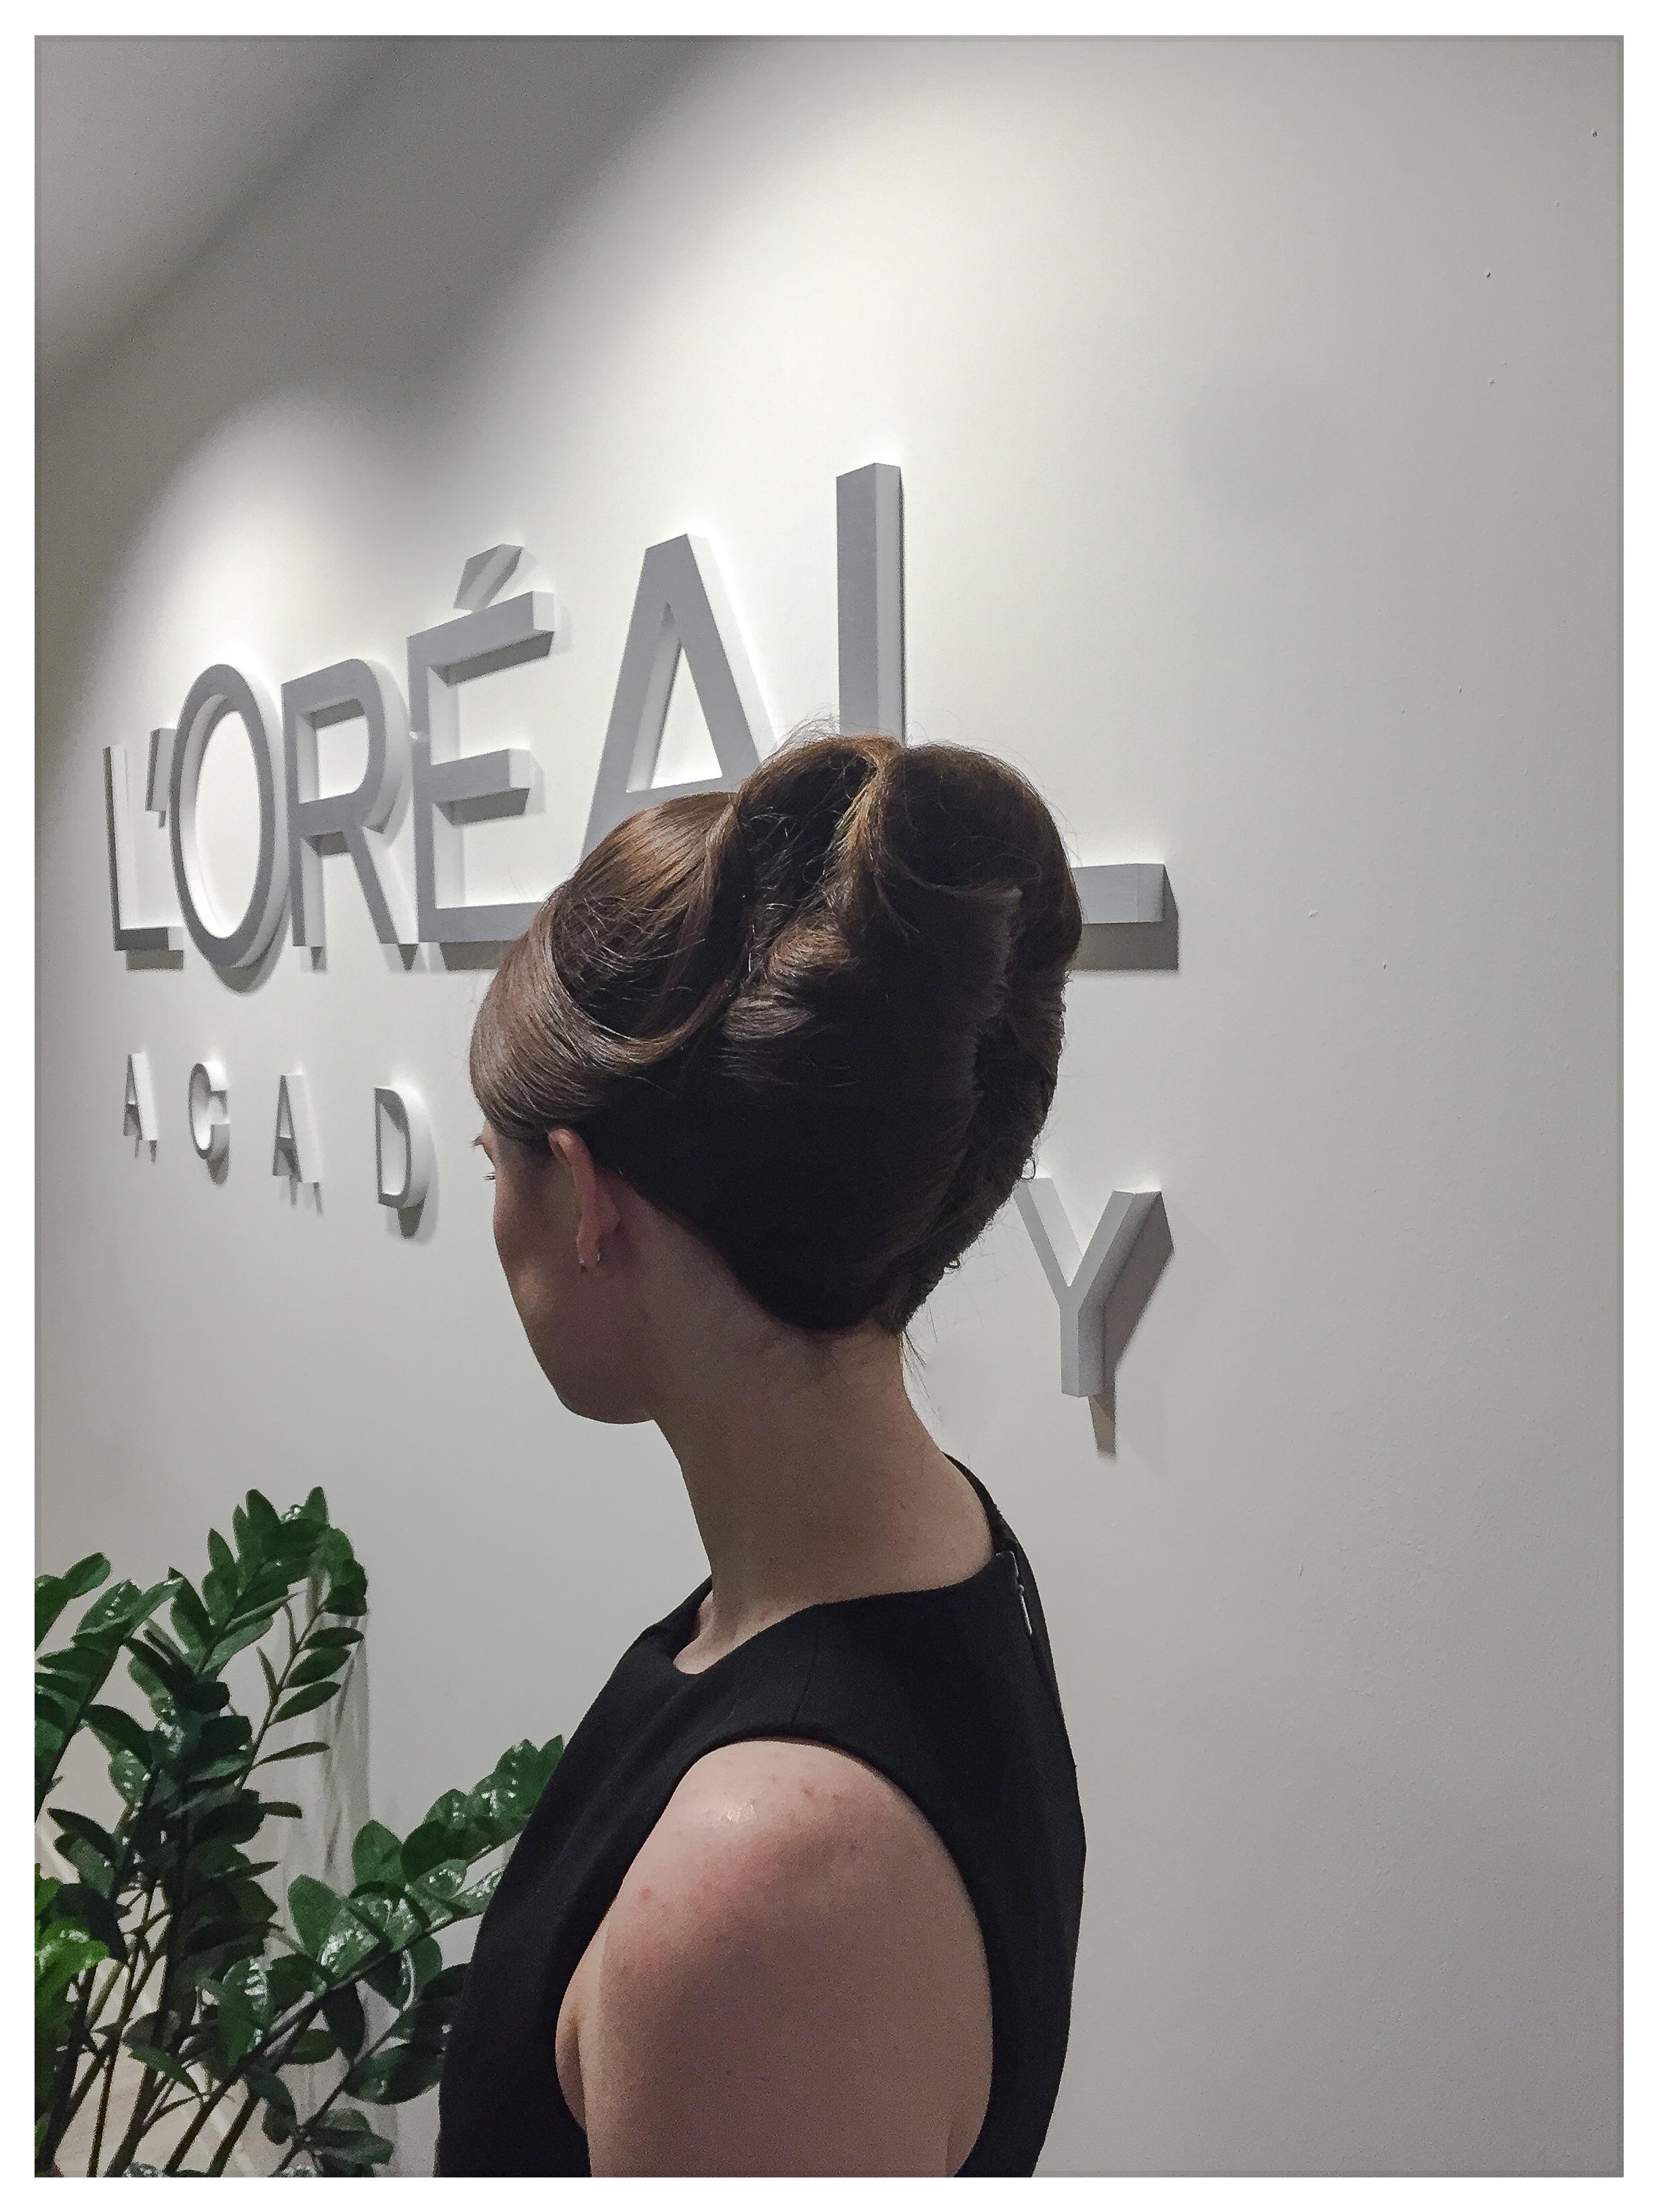 Model with Saks hair-up at L'Oreal